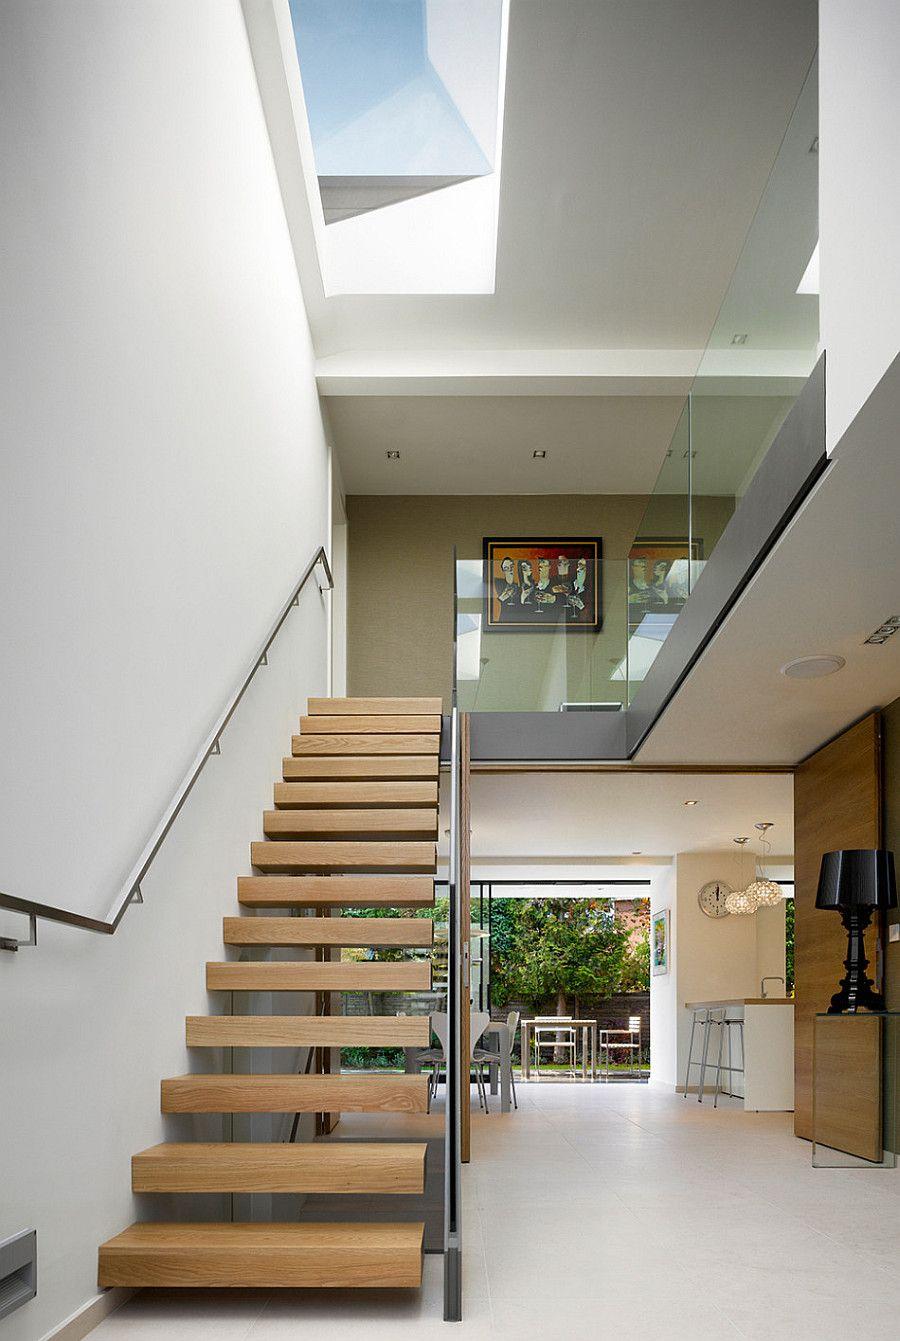 Minimalist House 85 Design: Minimalist House Design, House Stairs, Modern Minimalist